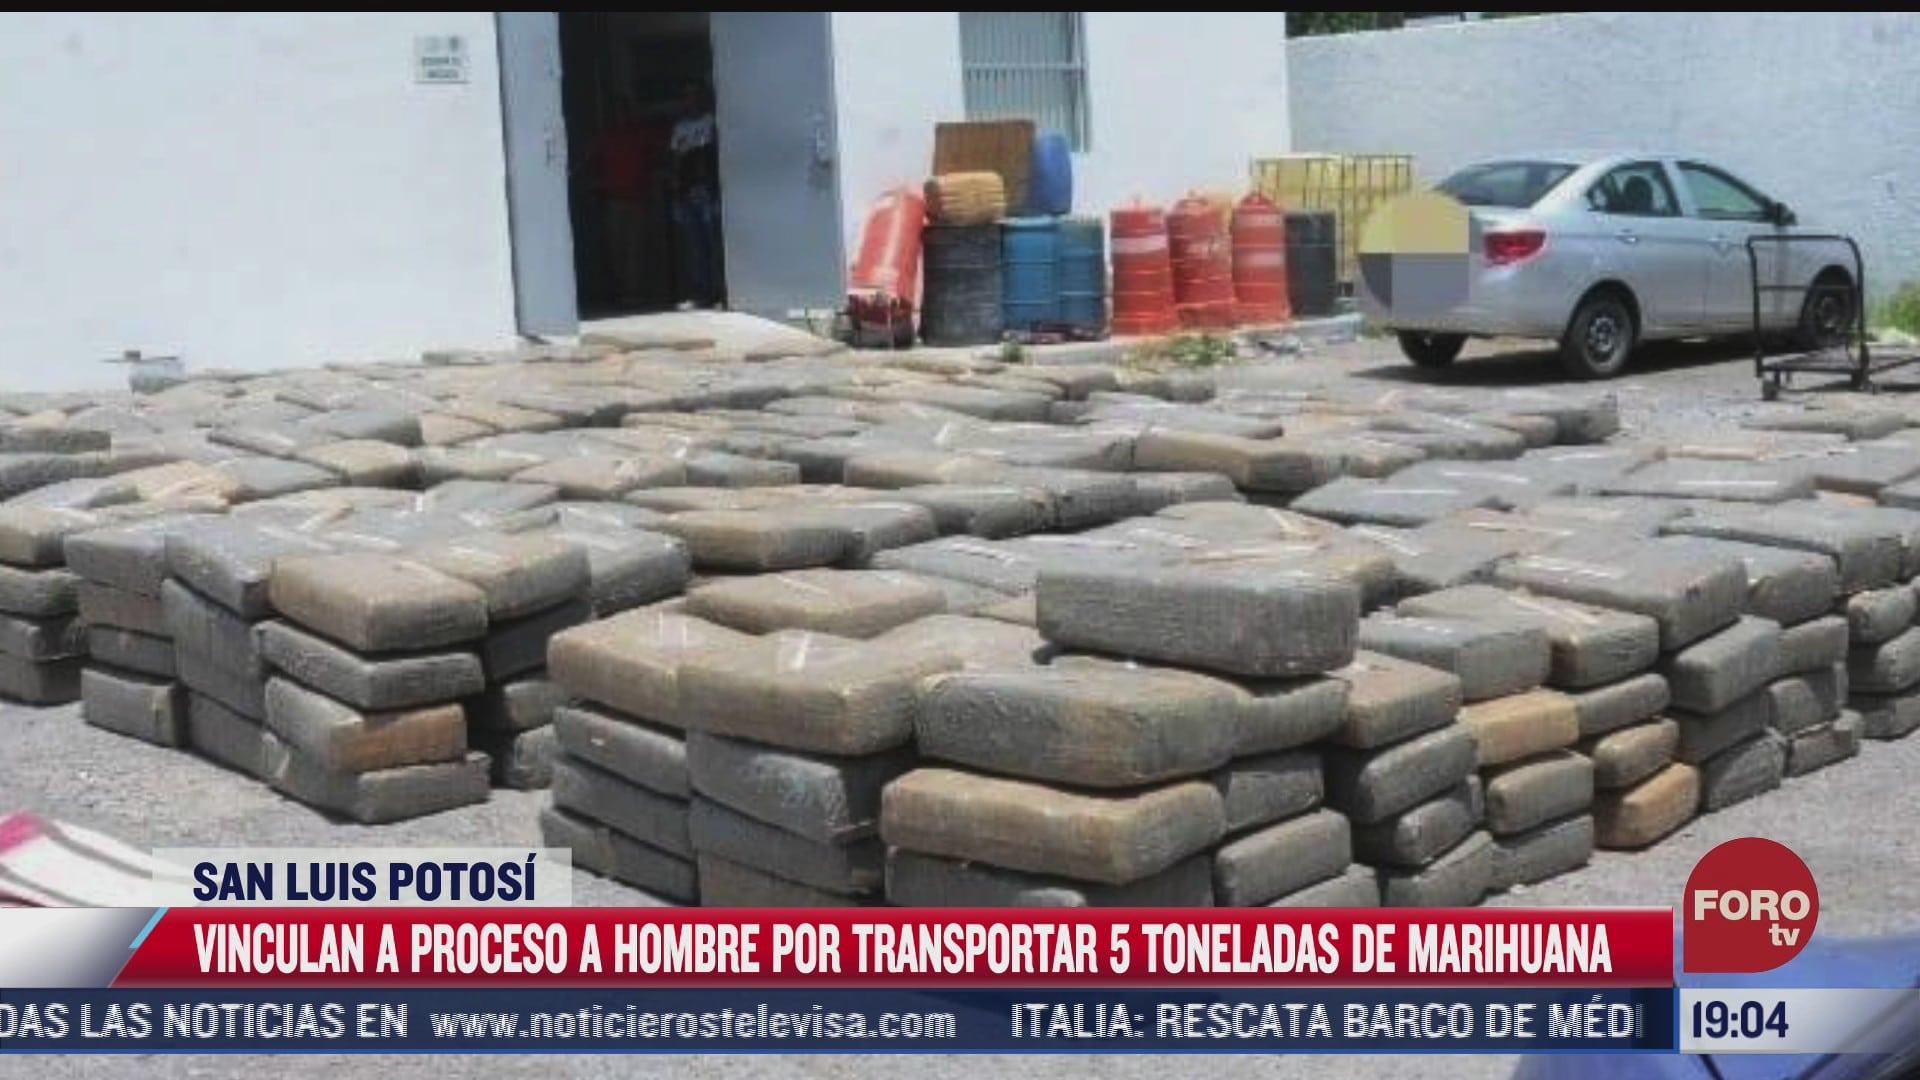 vinculan a proceso a hombre por trasladar 5 toneladas de marihuana